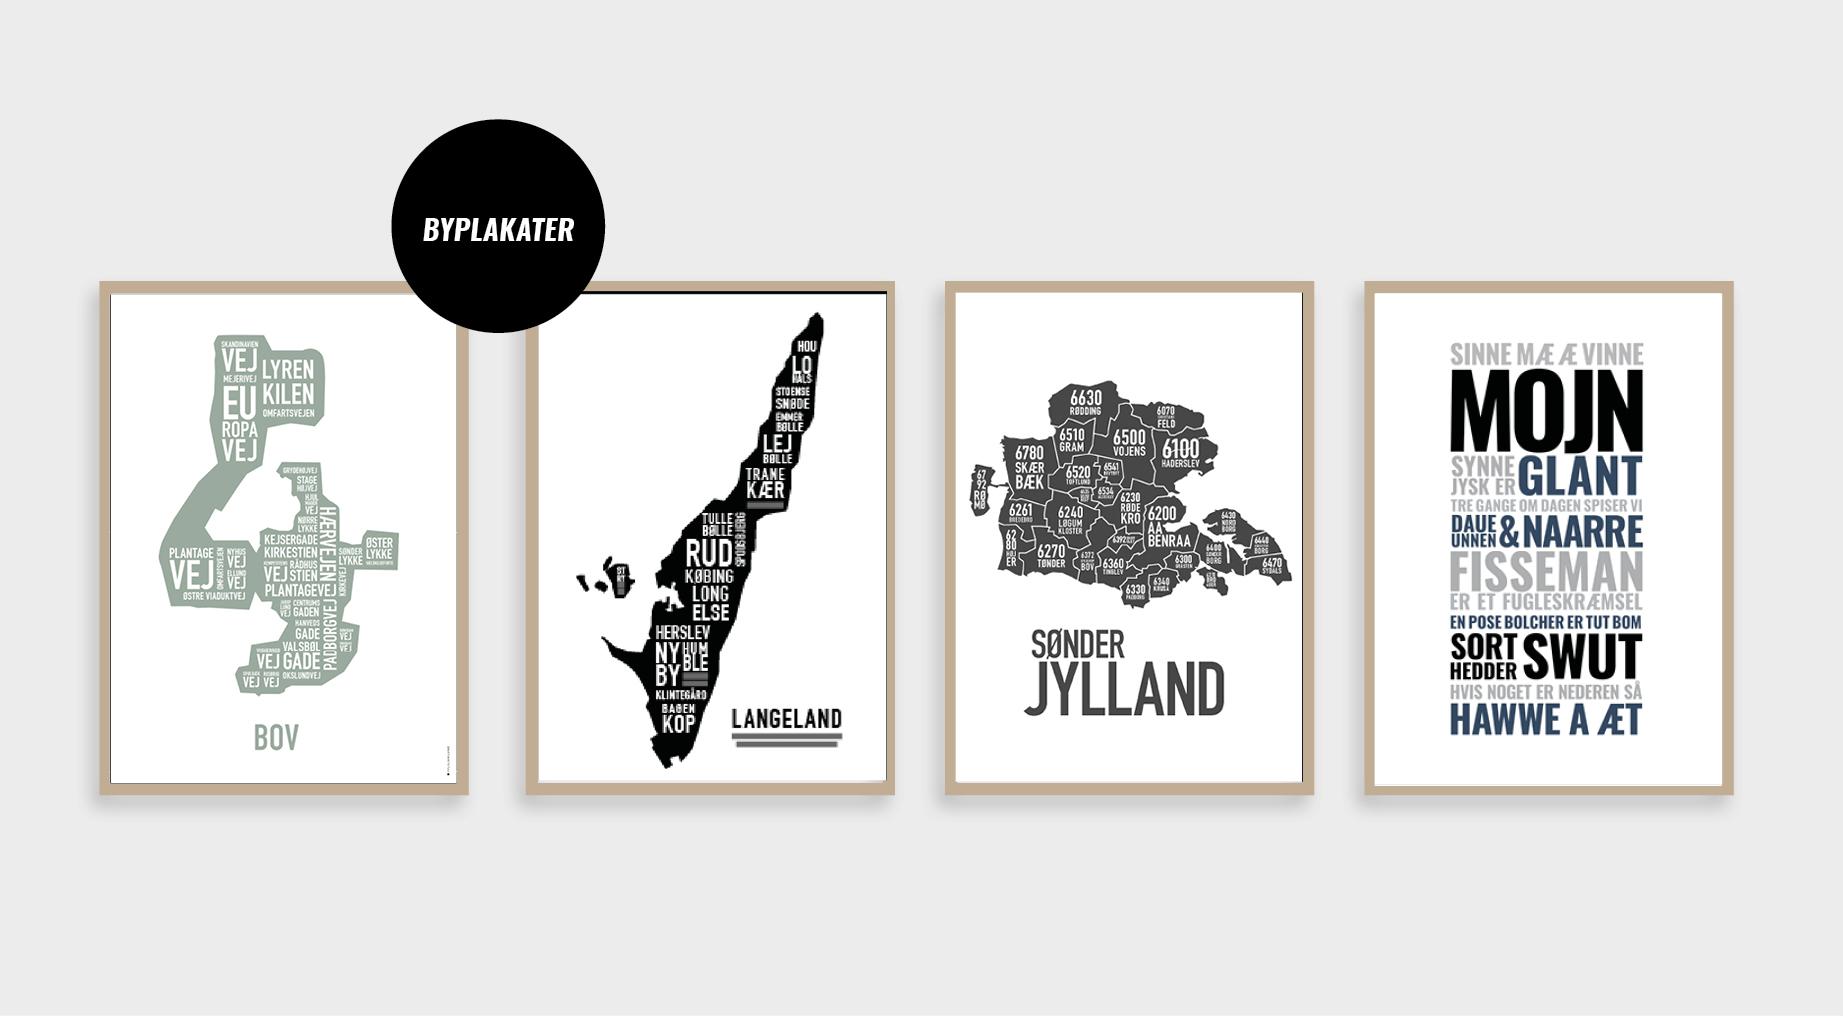 By- og stedplakater, sønderjylland, mojn, langeland, bov